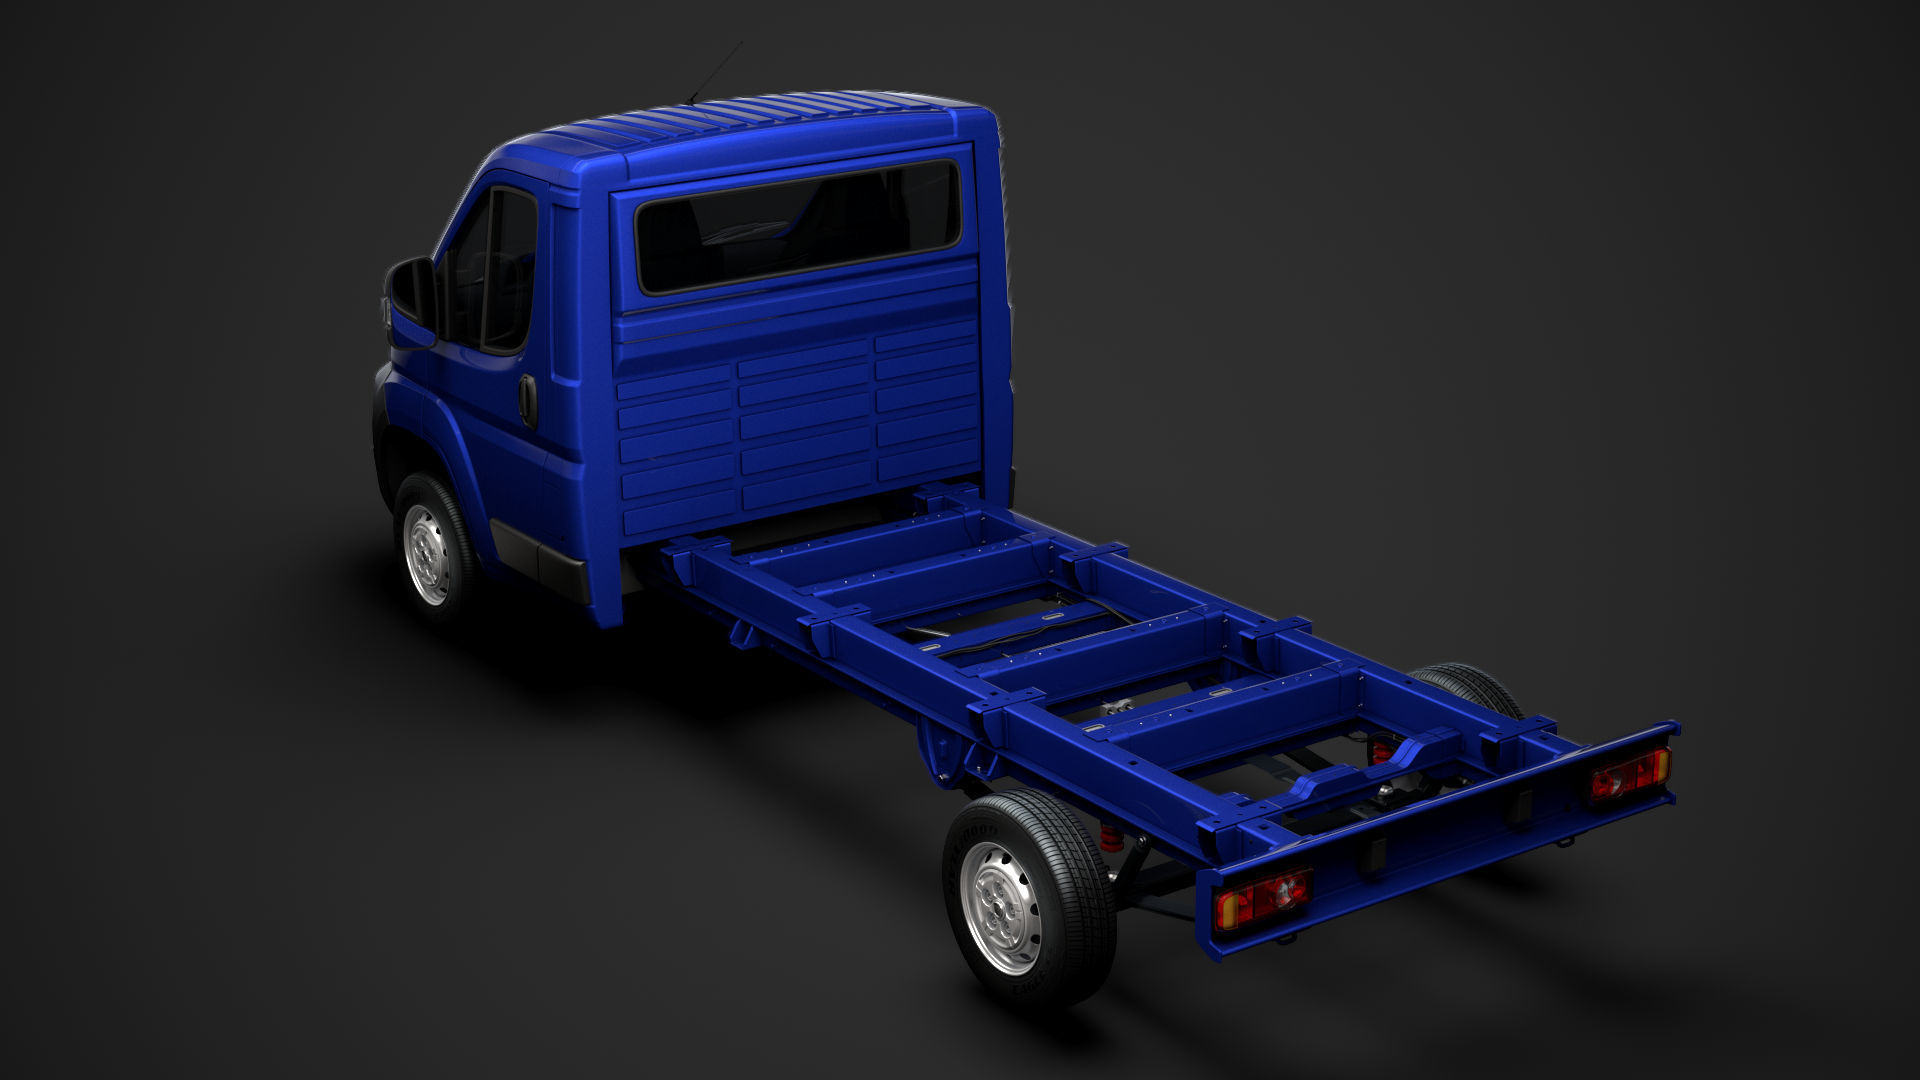 Fiat Ducato Chassis Truck Single Cab 4035WB 2014